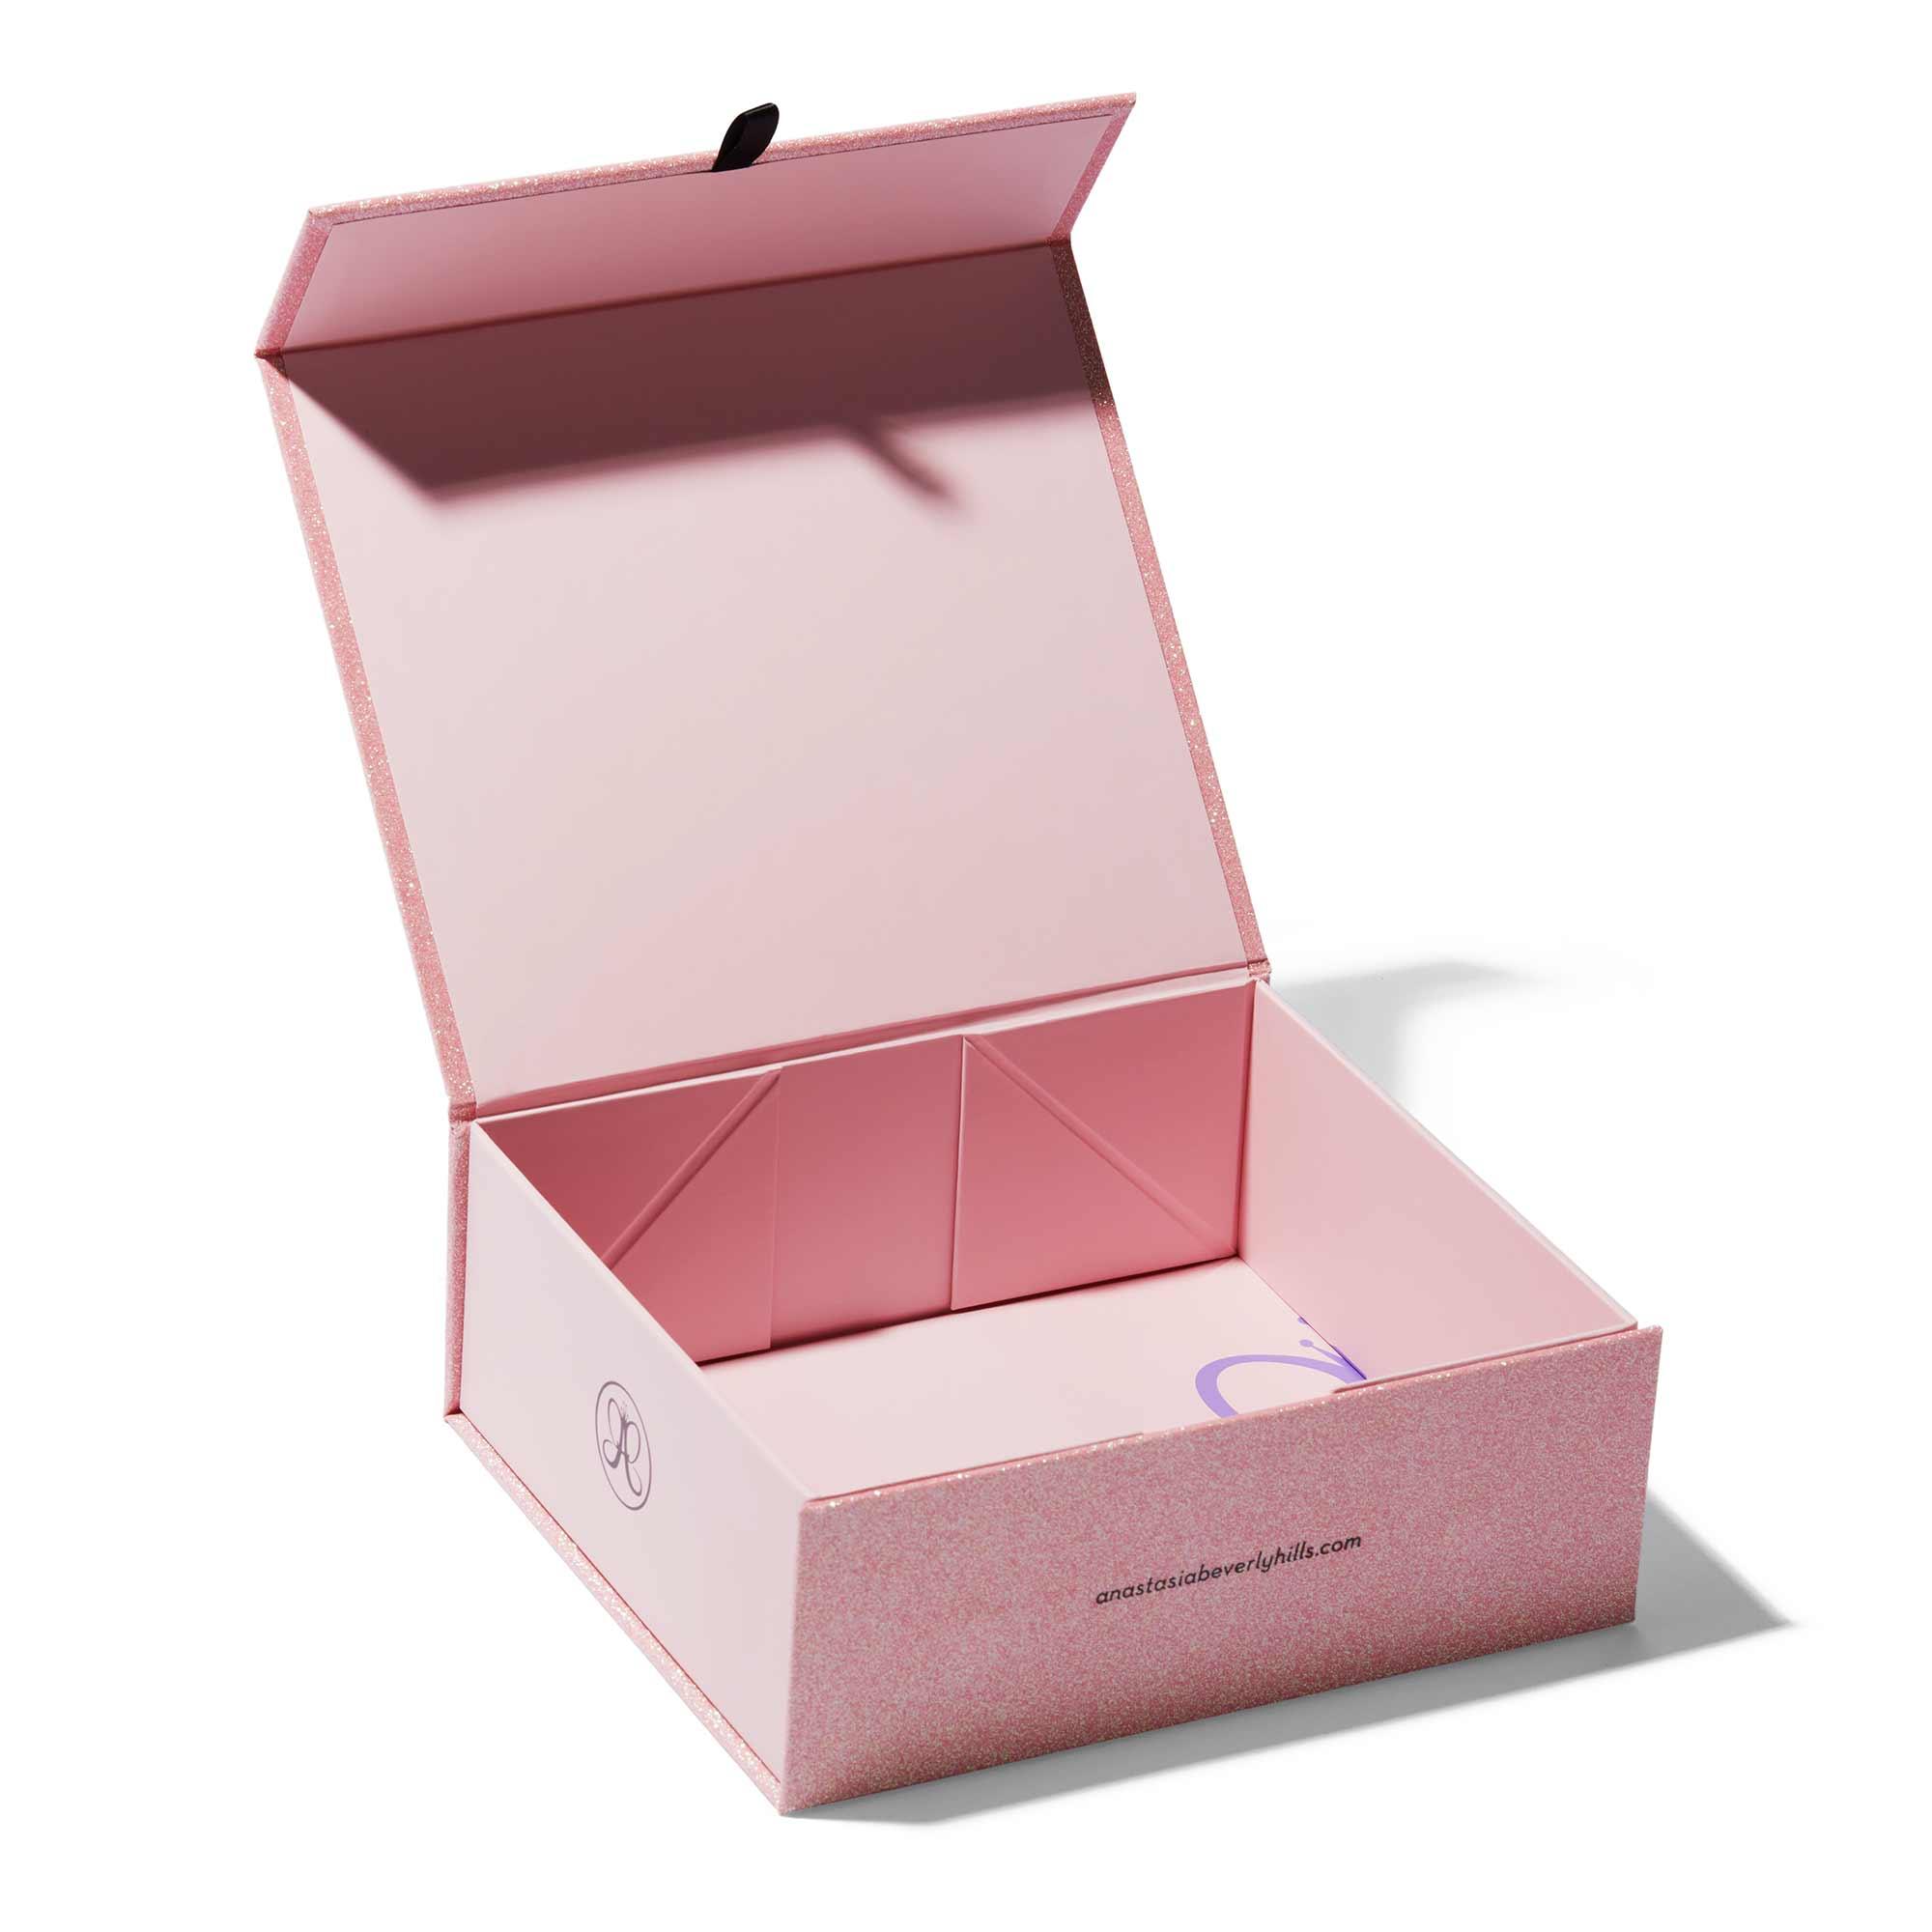 ABH Gift Box - Pink